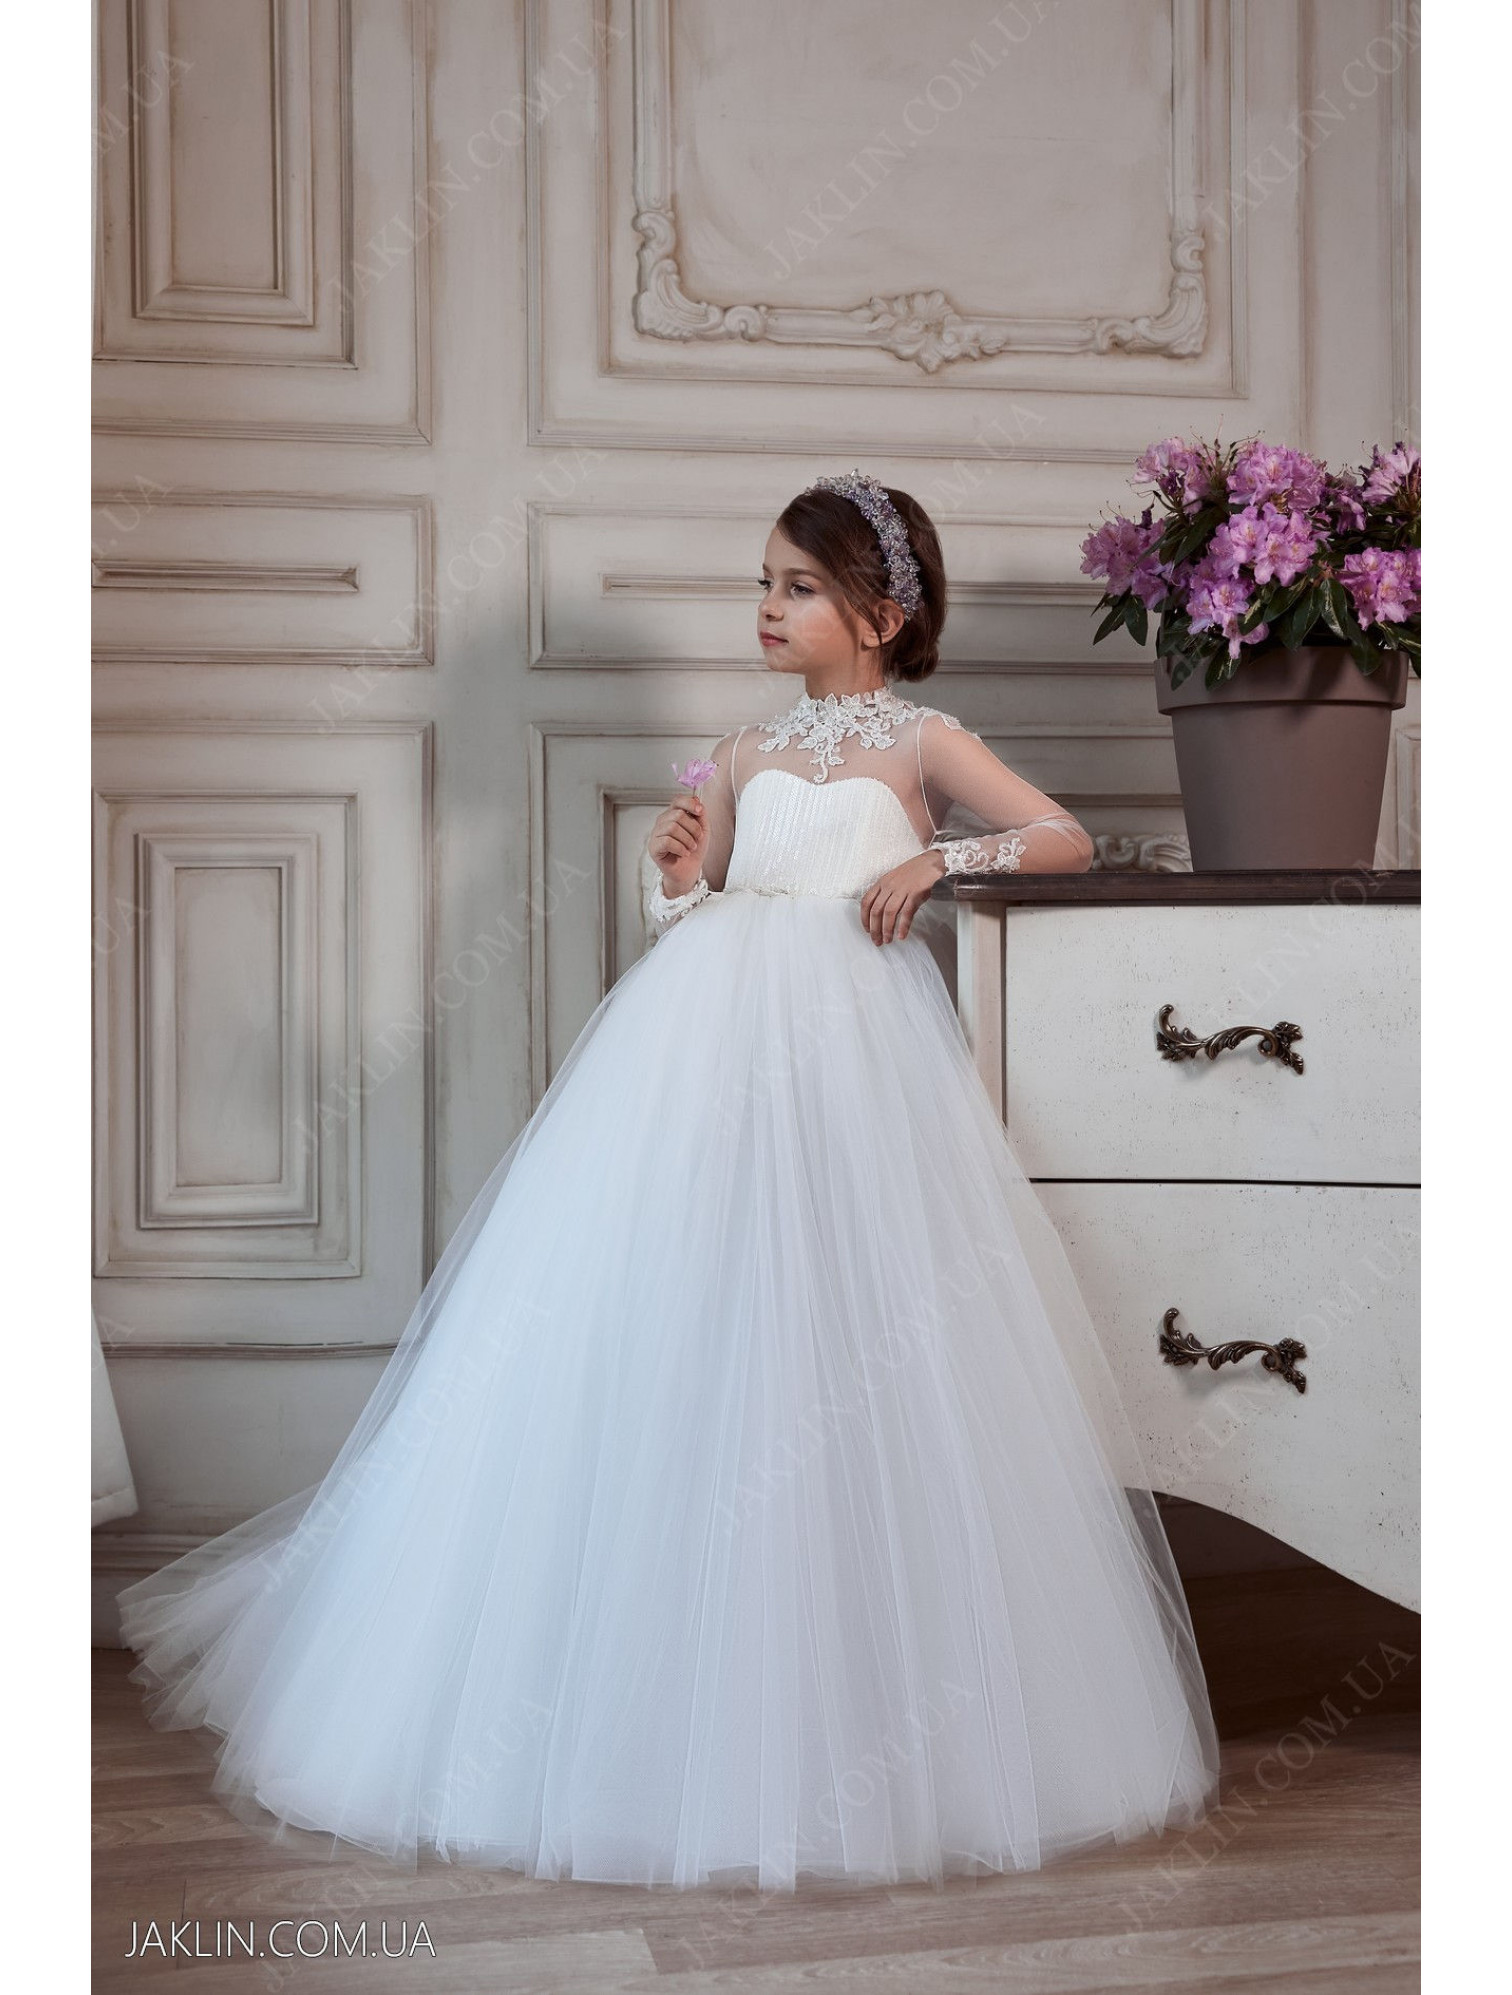 Child dress 3139